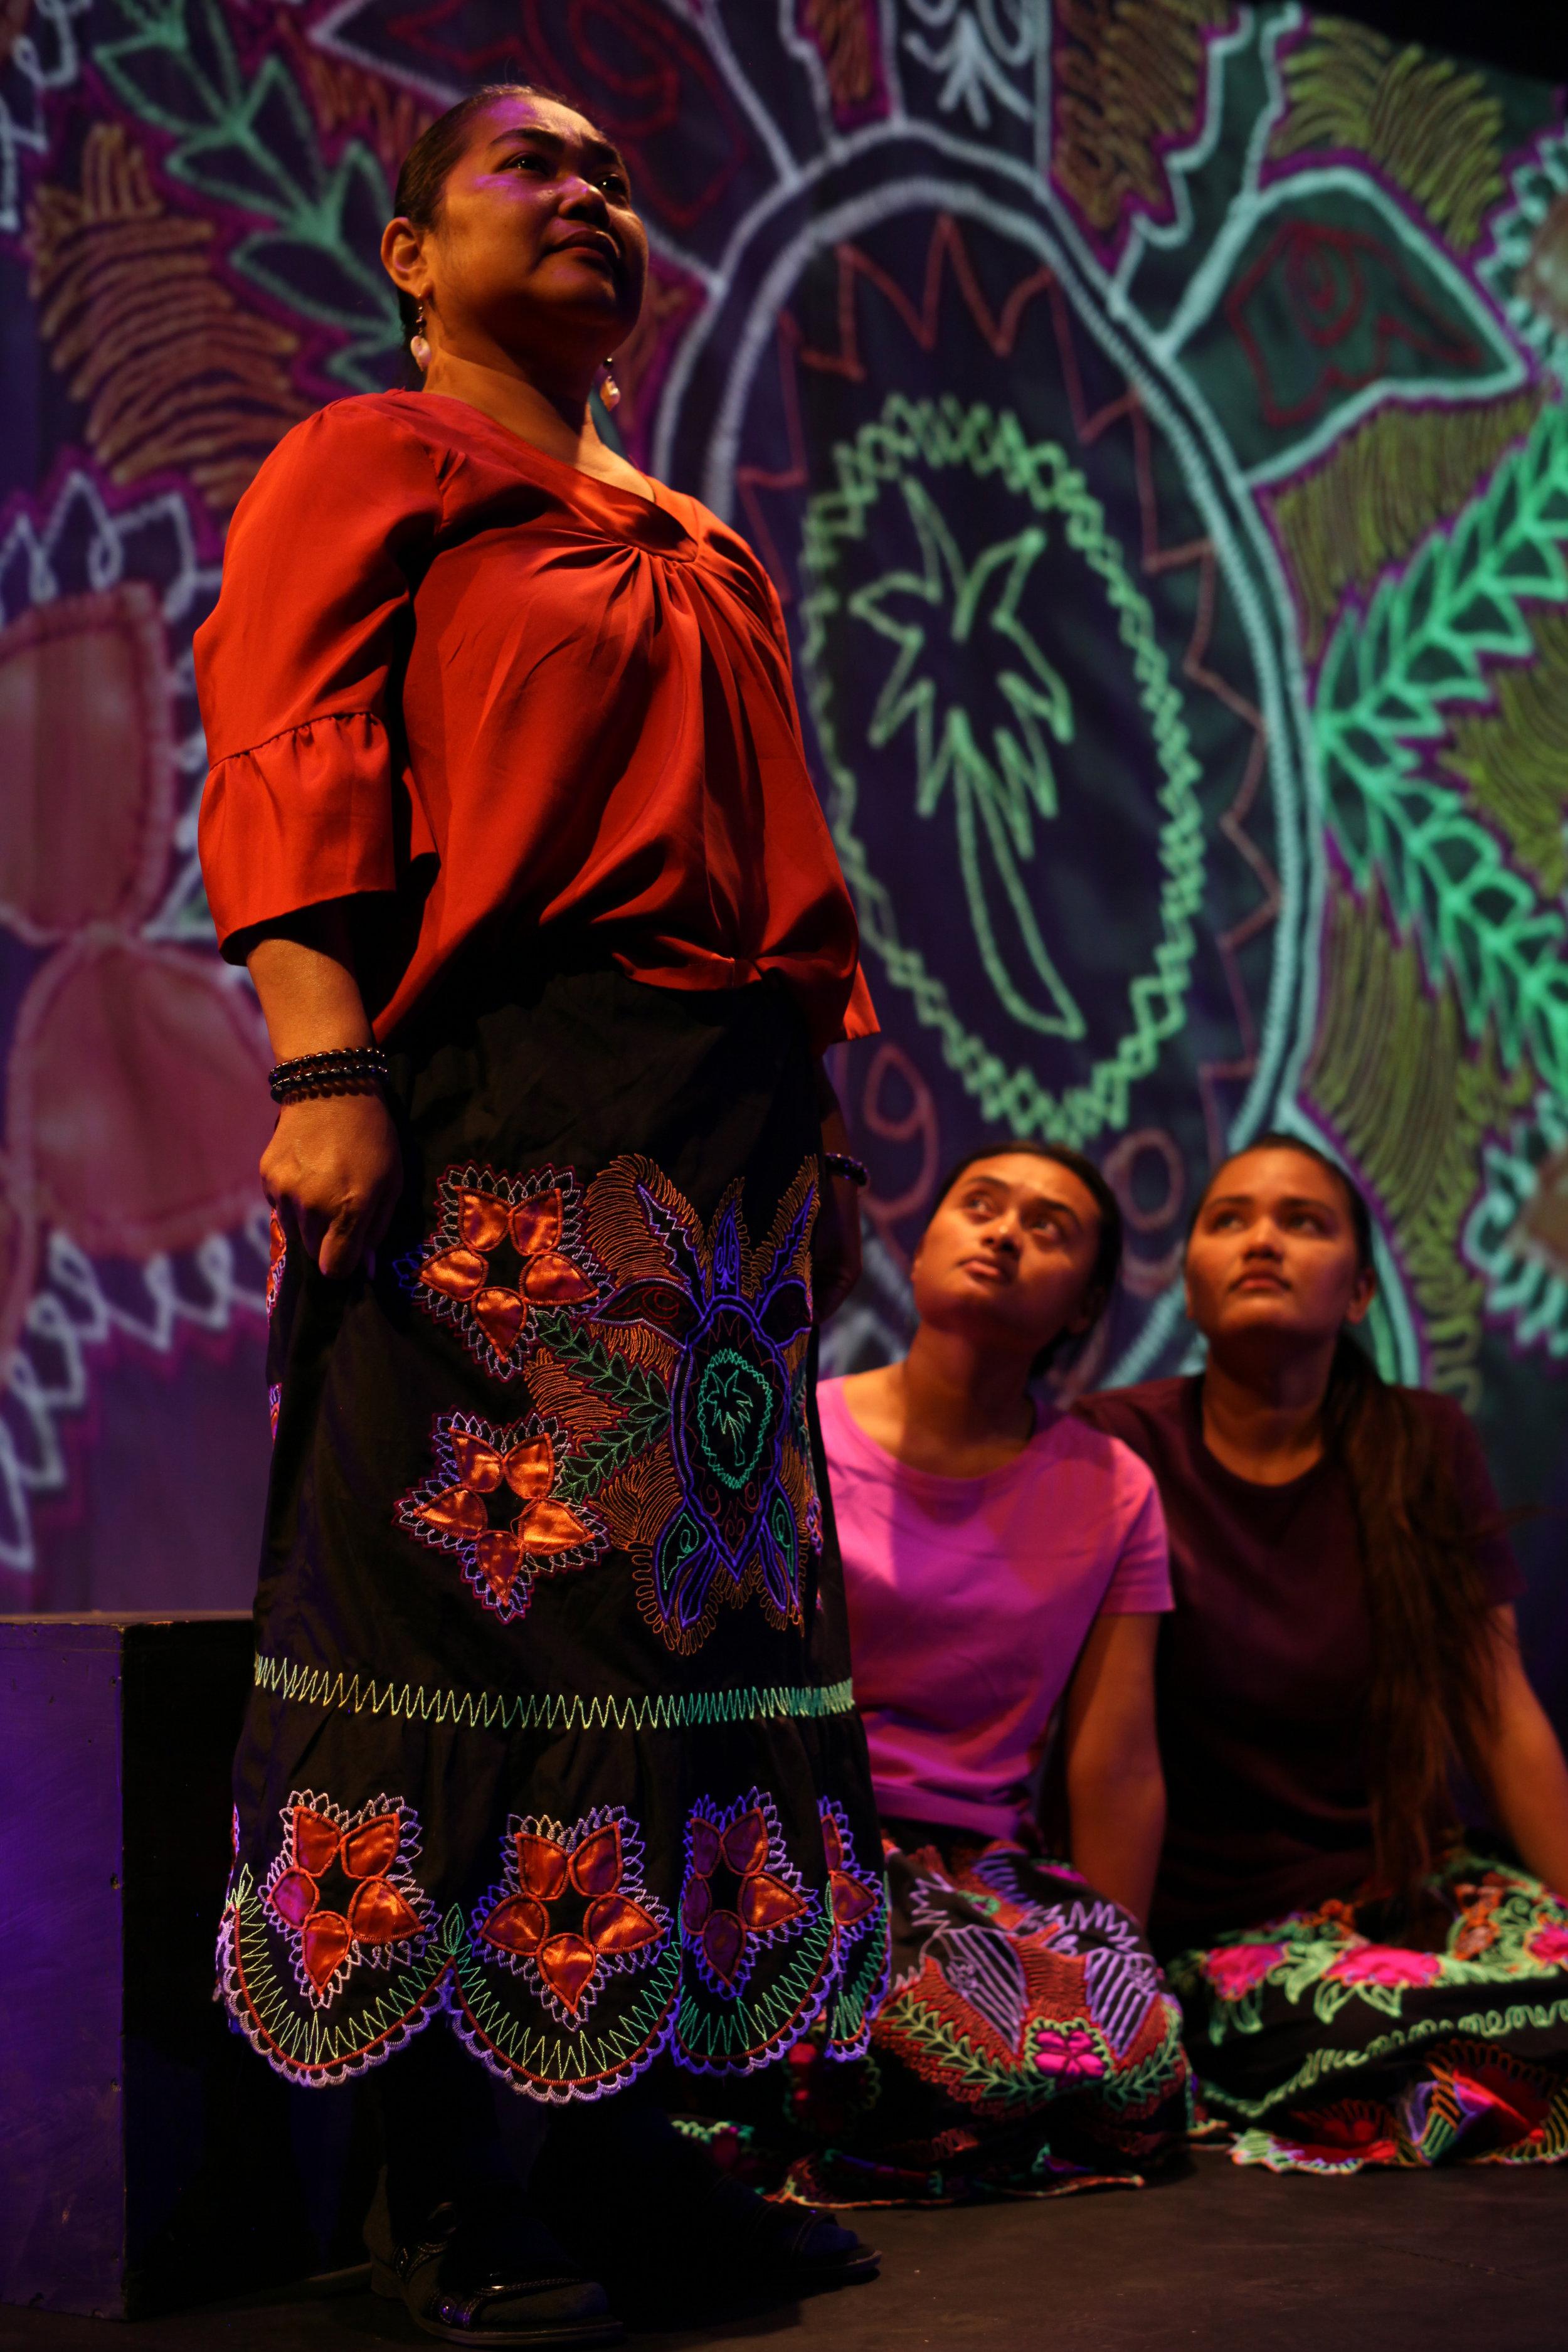 Innocenta Sound-Kikku, Jayceleen Ifenuk, Emeraldrose Hadik, in 'Masters of the Currents' Presented by Pangea World Theatre & TeAda Productions in Minneapolis, Minnesota. Photo by Joan Osato.